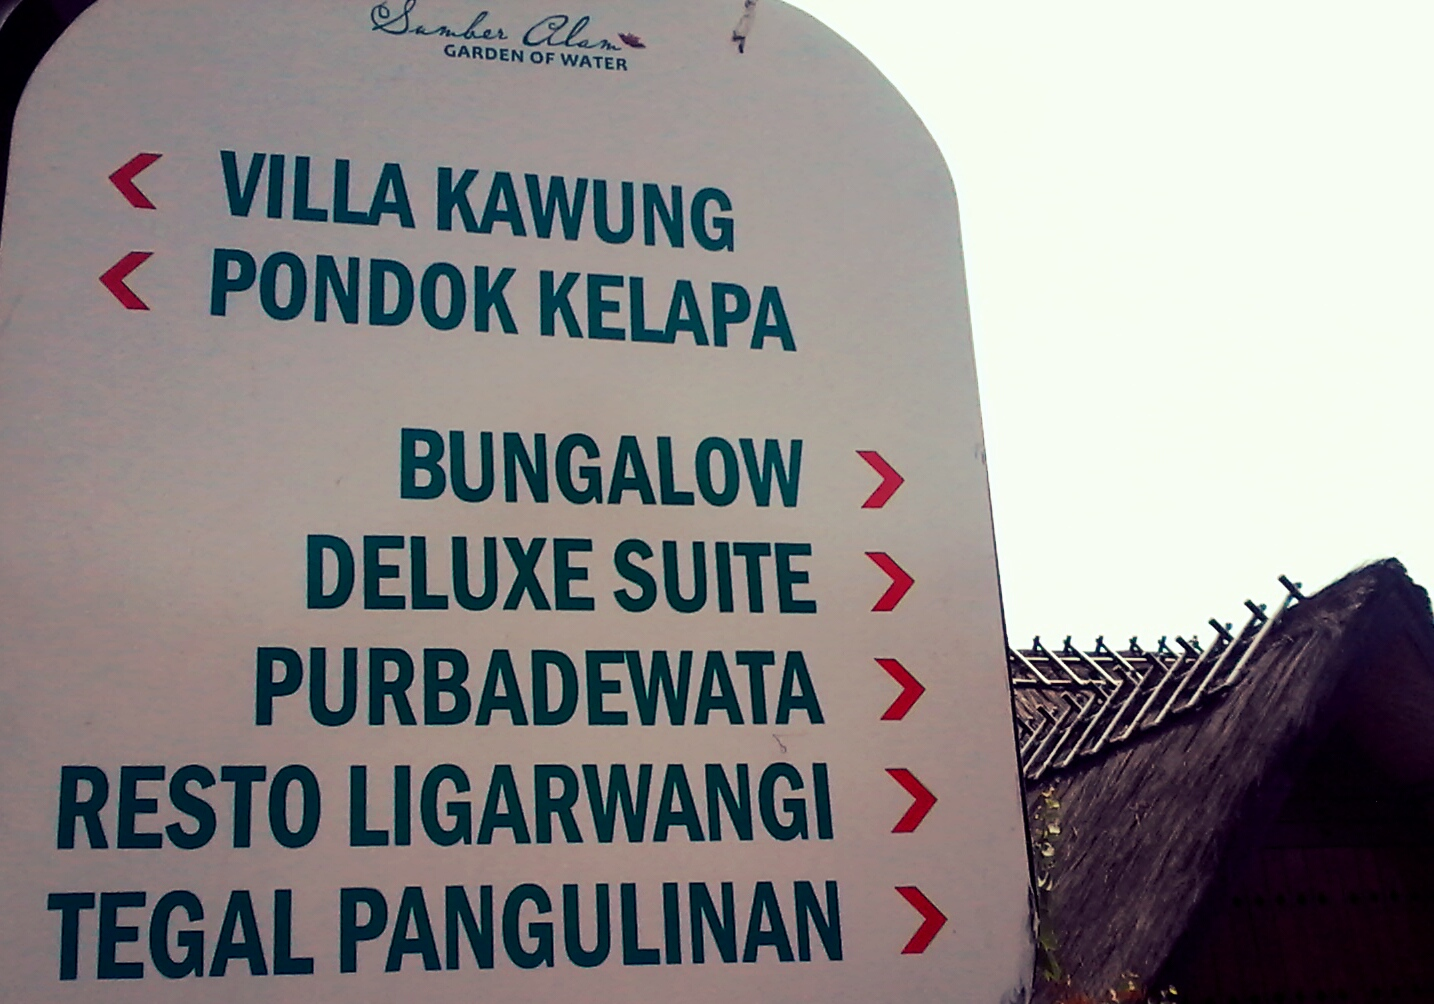 travelplusindonesia  Tempat Terbaik Merangkai Bunga Tidur di Garut ... a49e317567